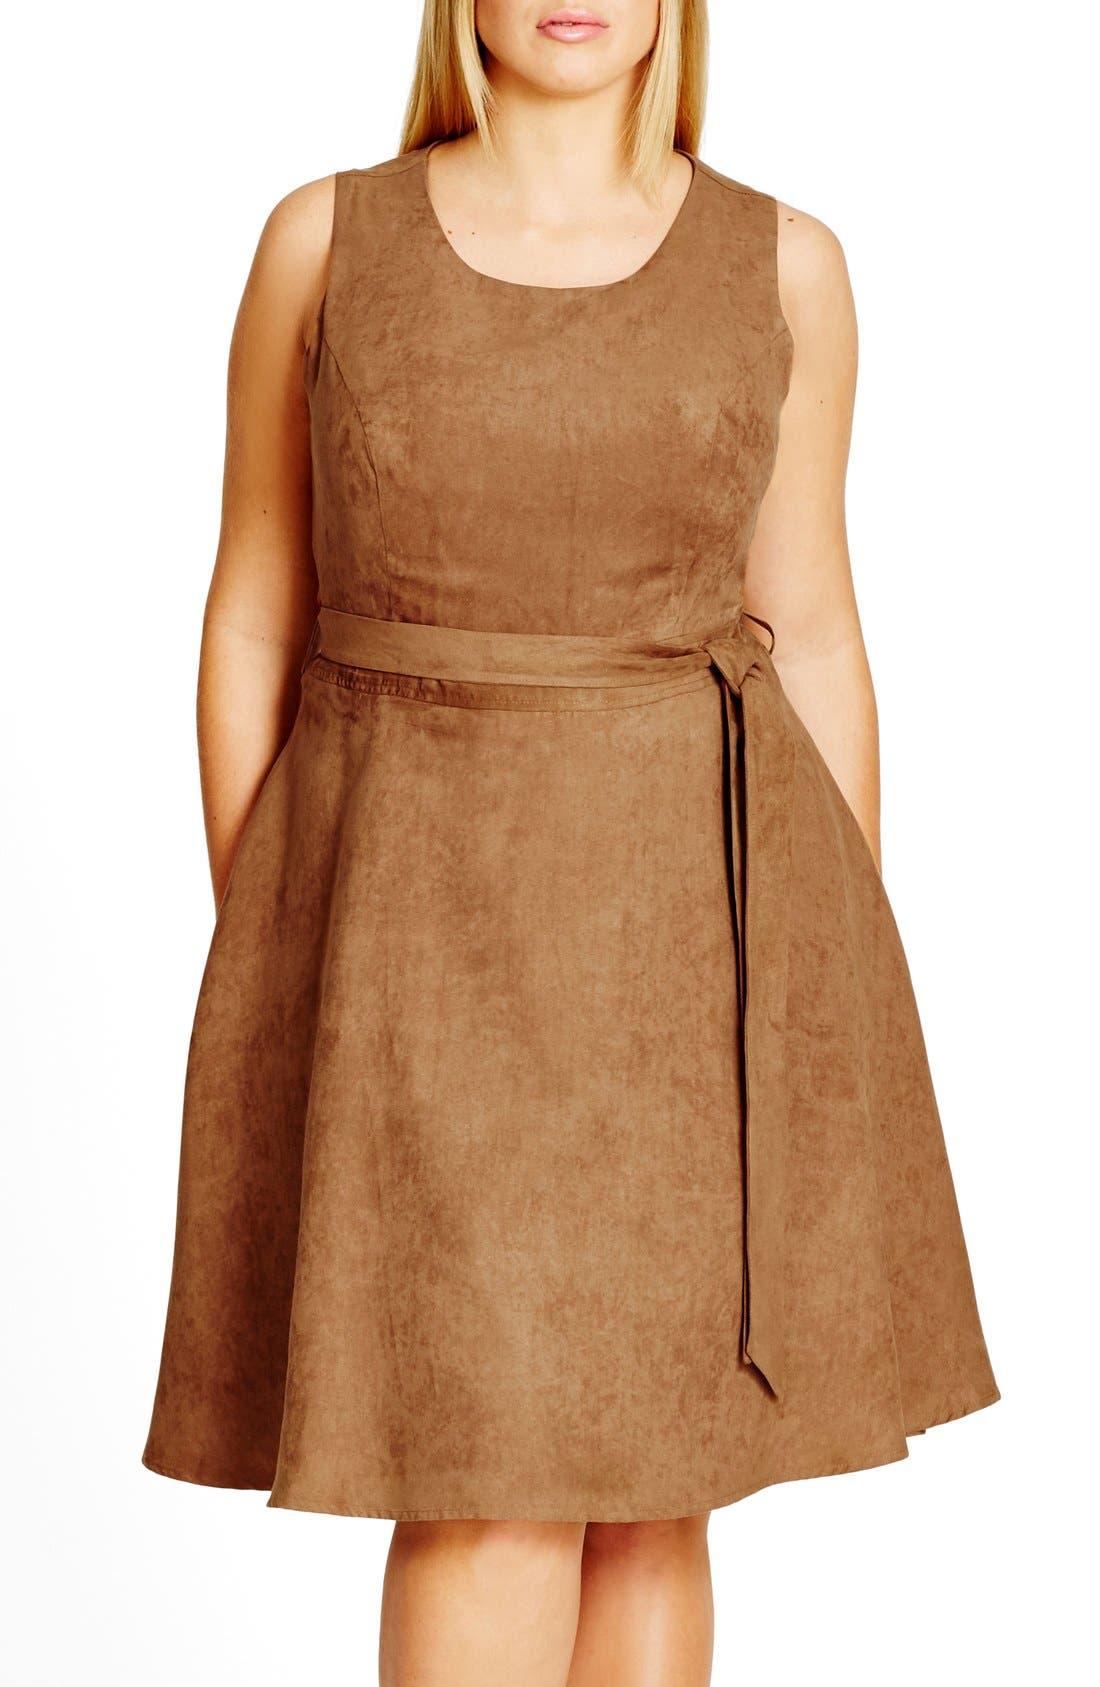 Main Image - City Chic Faux Suede Fit & Flare Dress (Plus Size)